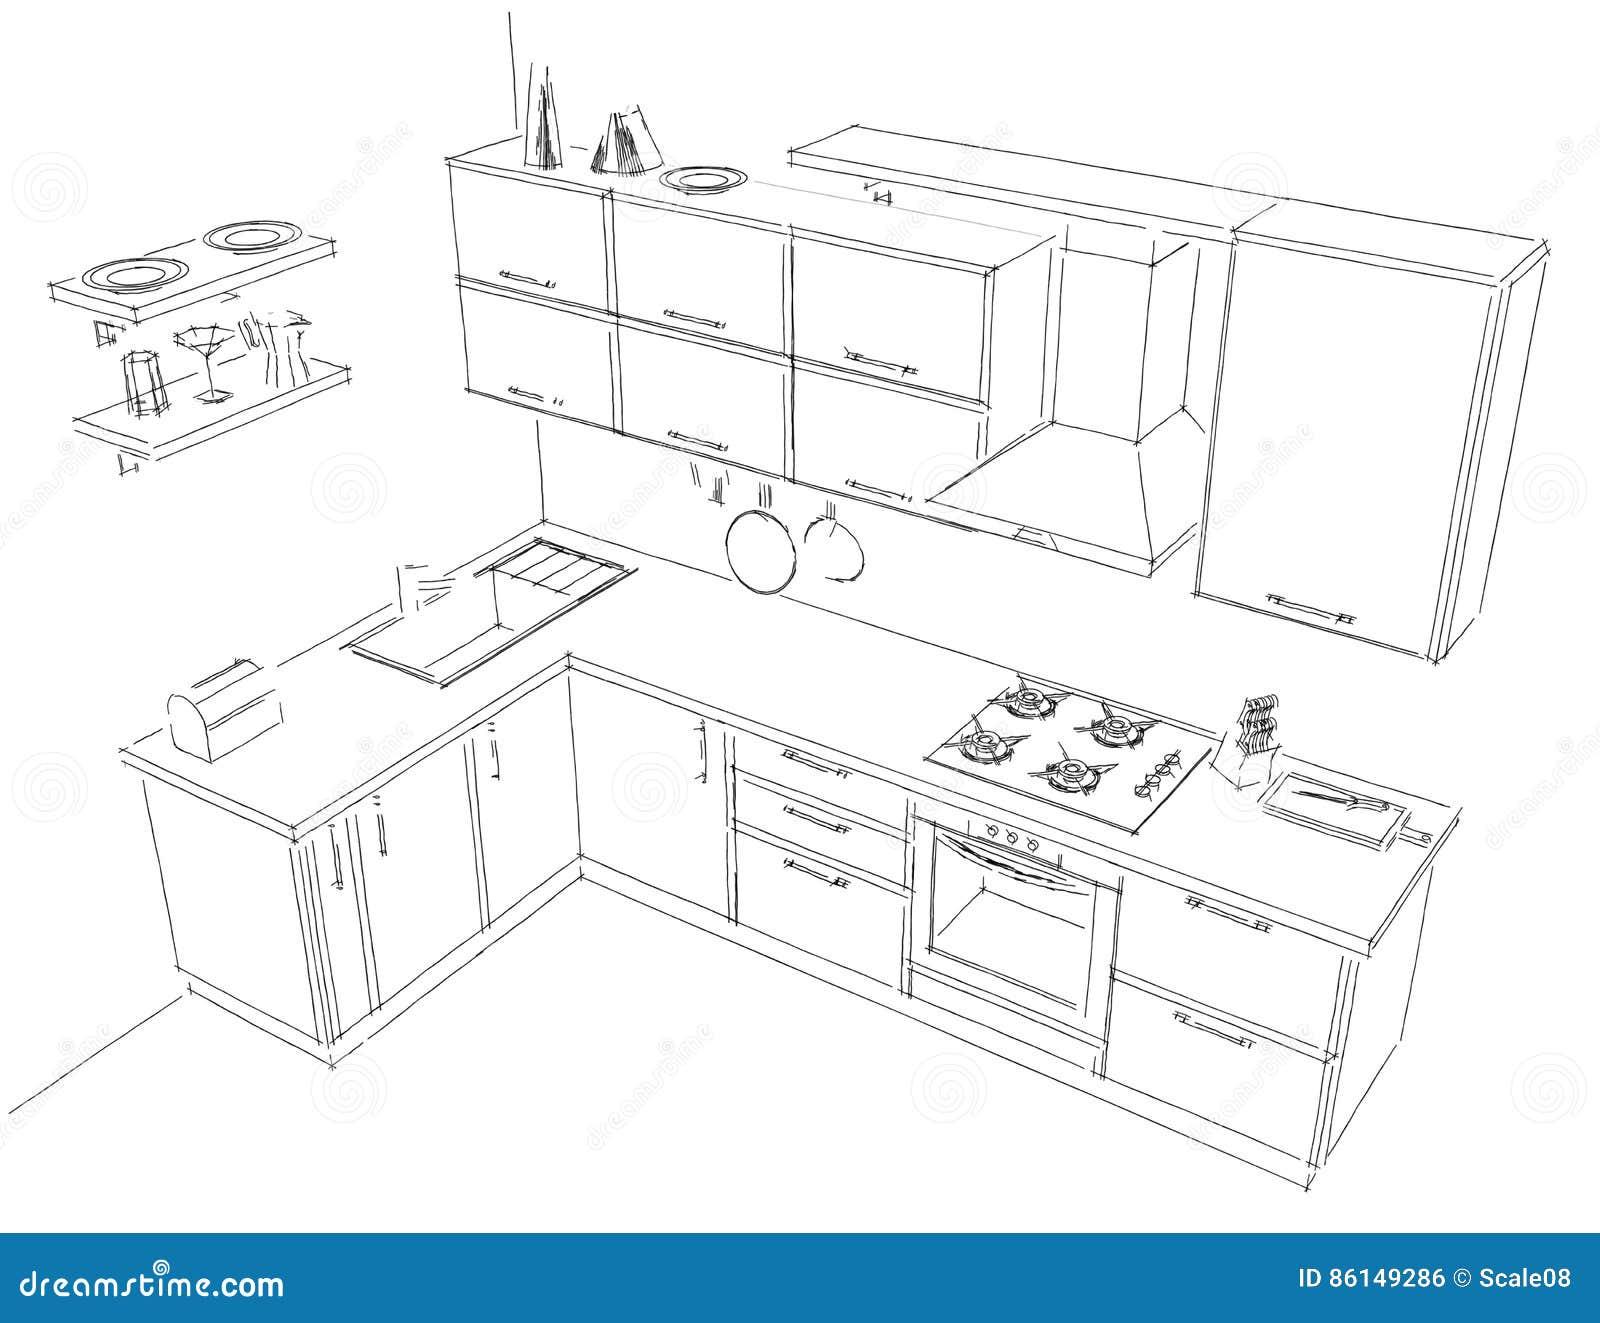 Dessiner cuisine 3d exceptional dessiner cuisine en d for Ikea dessin cuisine